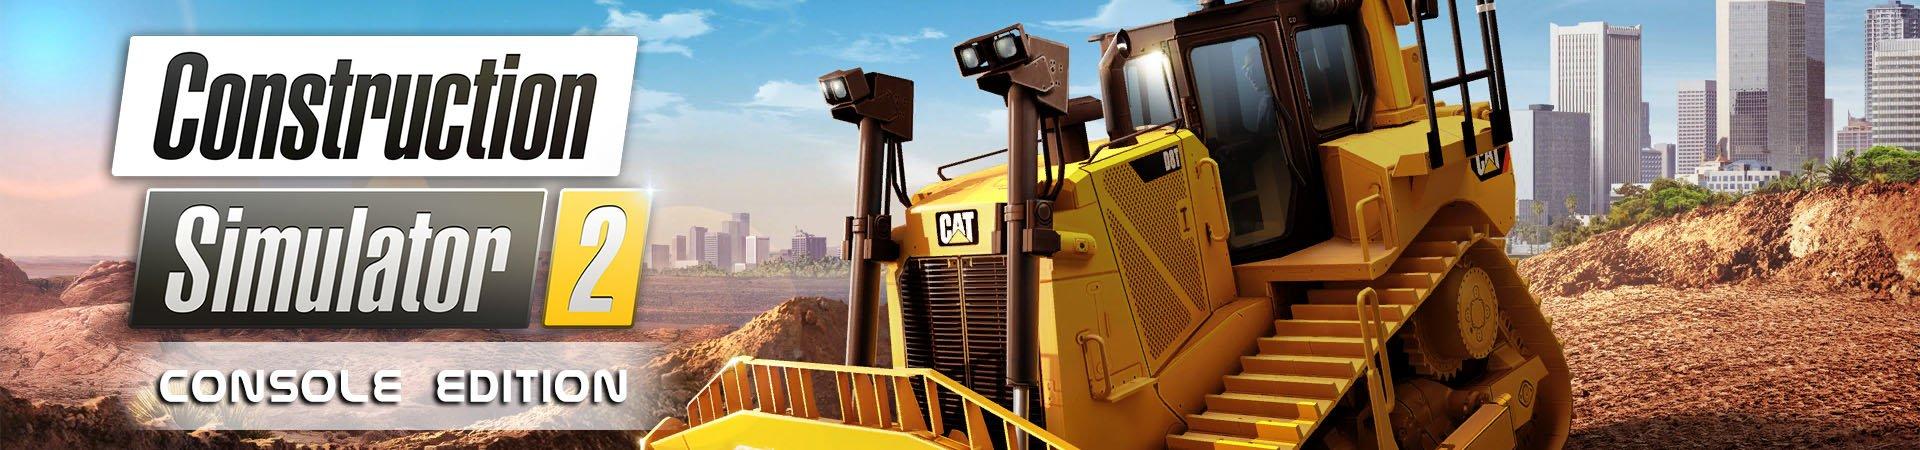 Construction Simulator 2 US - Console Edition (PS4) Review | GamePitt -  astragon Entertainment